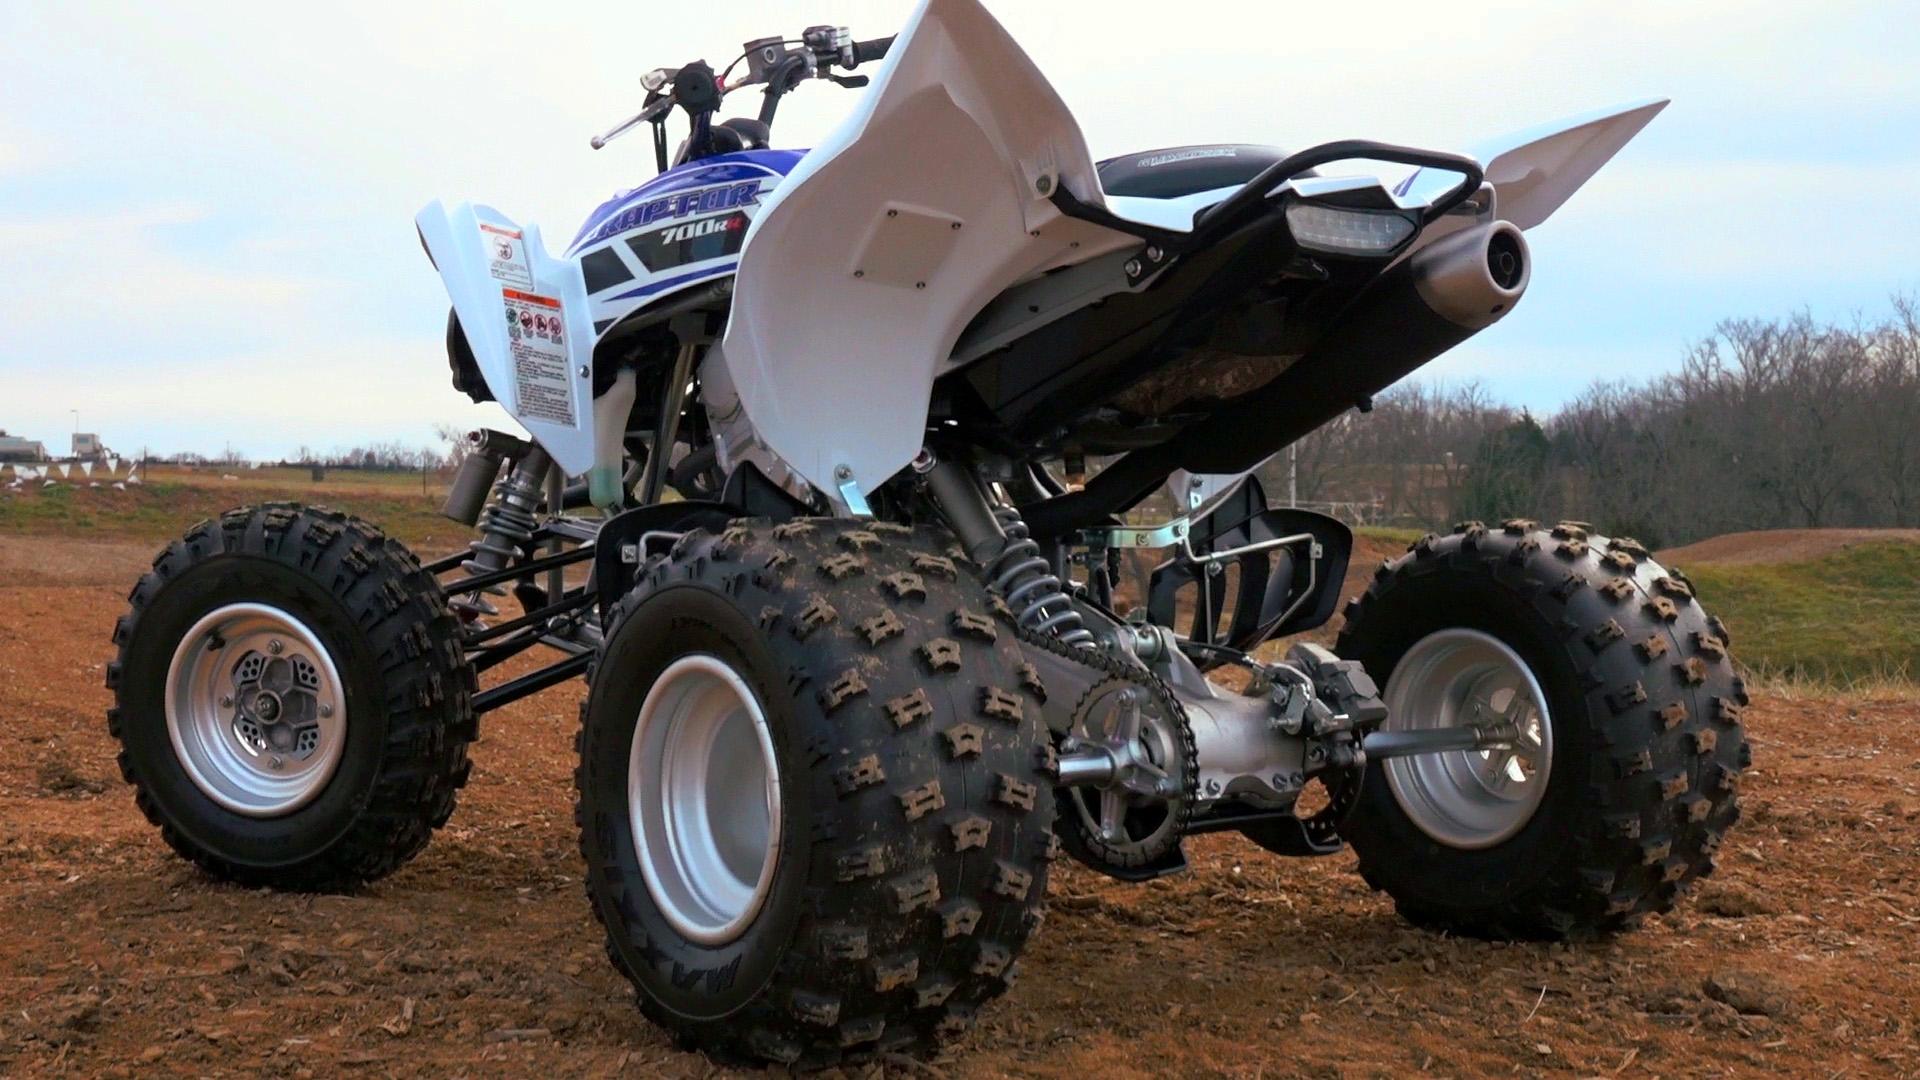 Prototype Yamaha Raptor 700R: Test